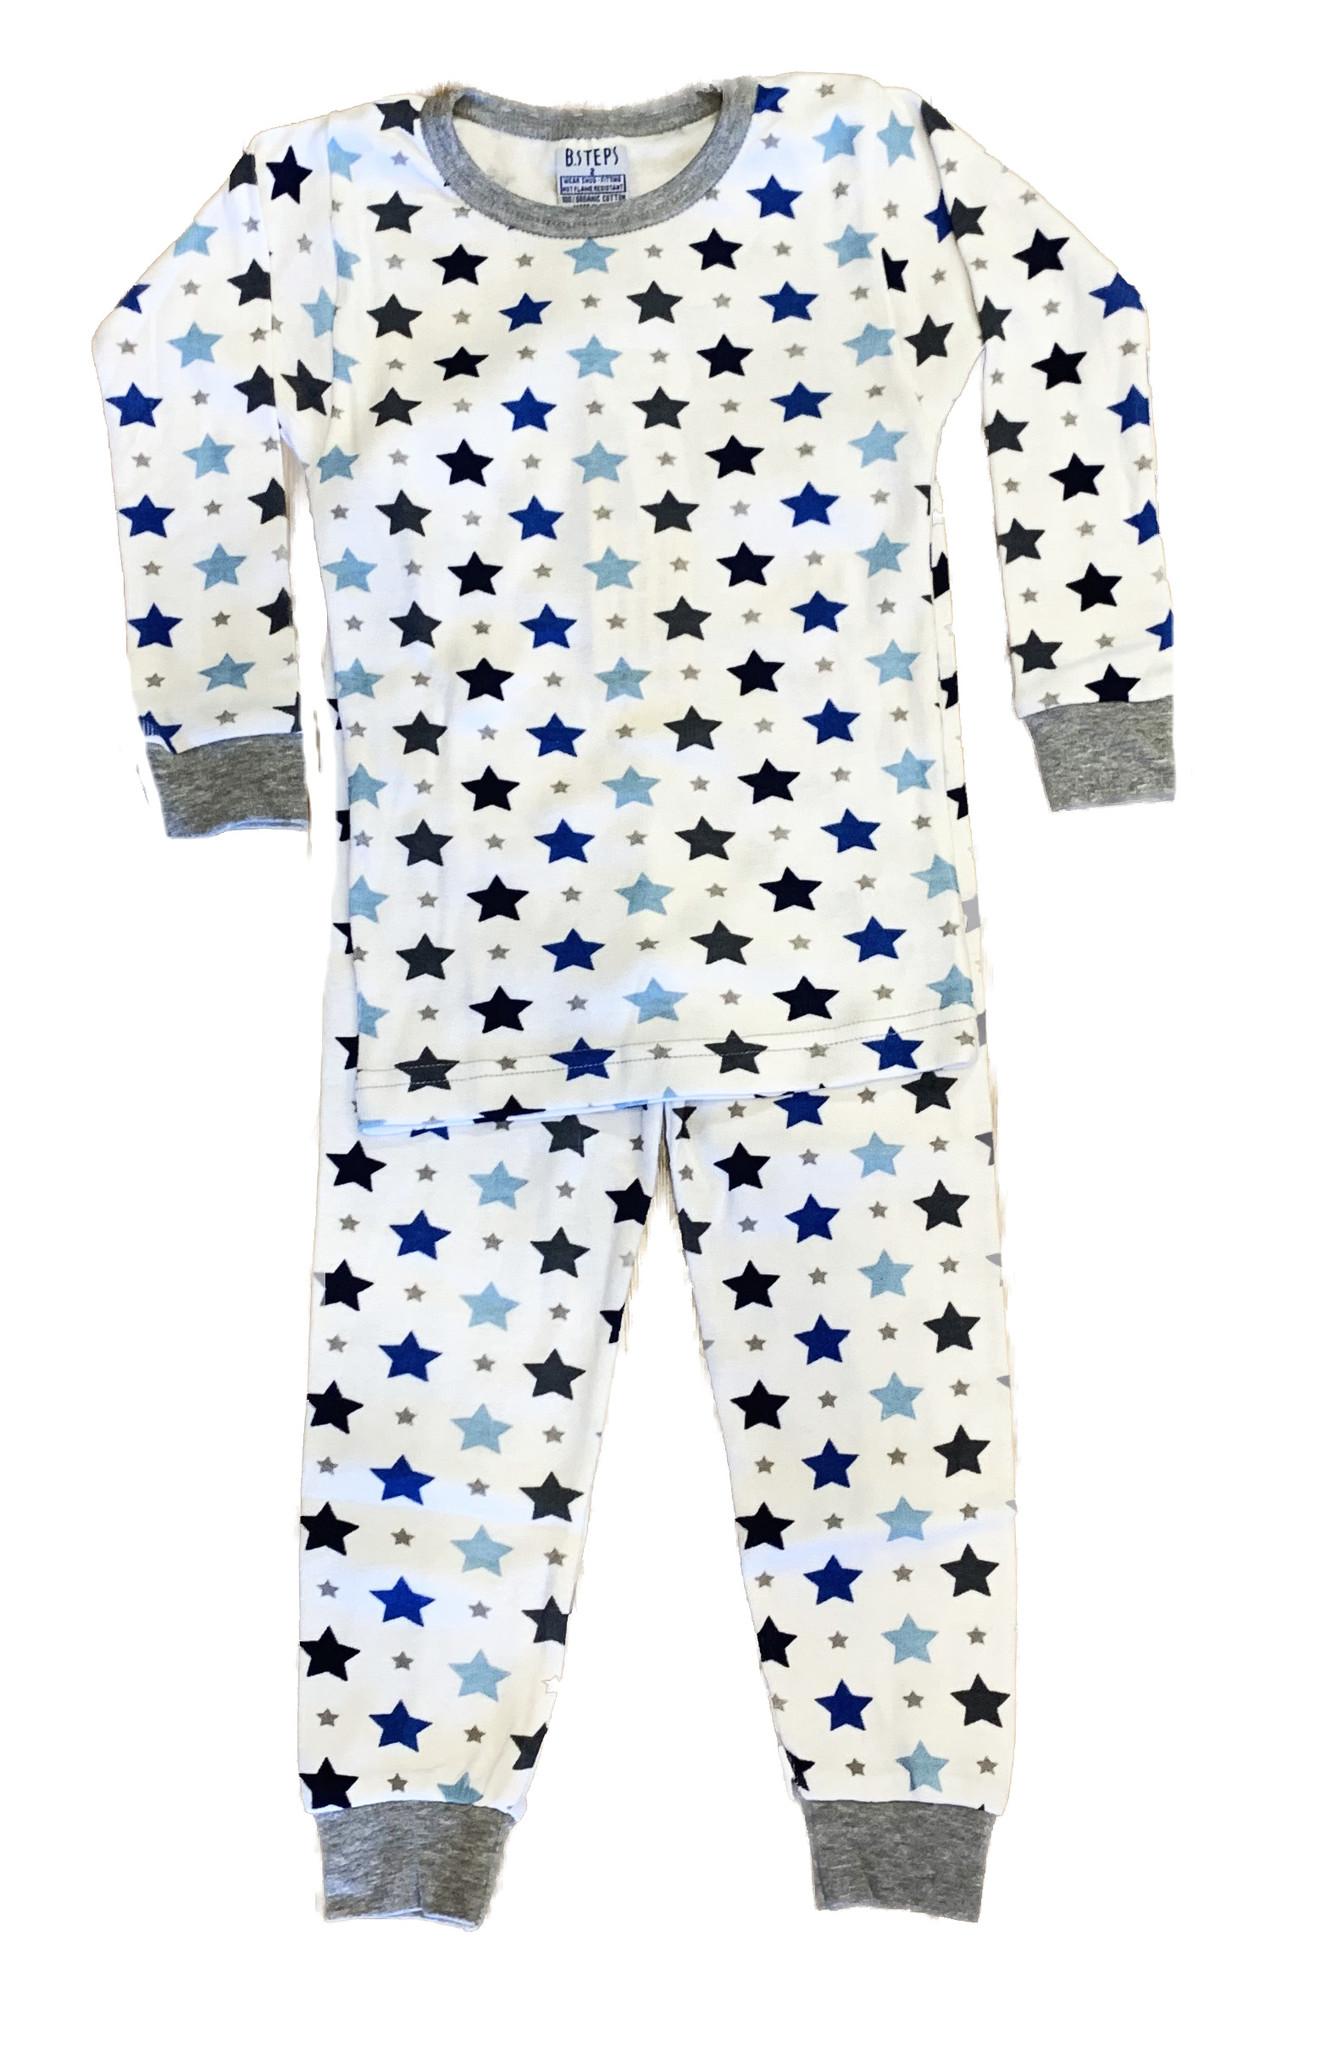 Baby Steps Blue Grey Stars Infant PJ Set